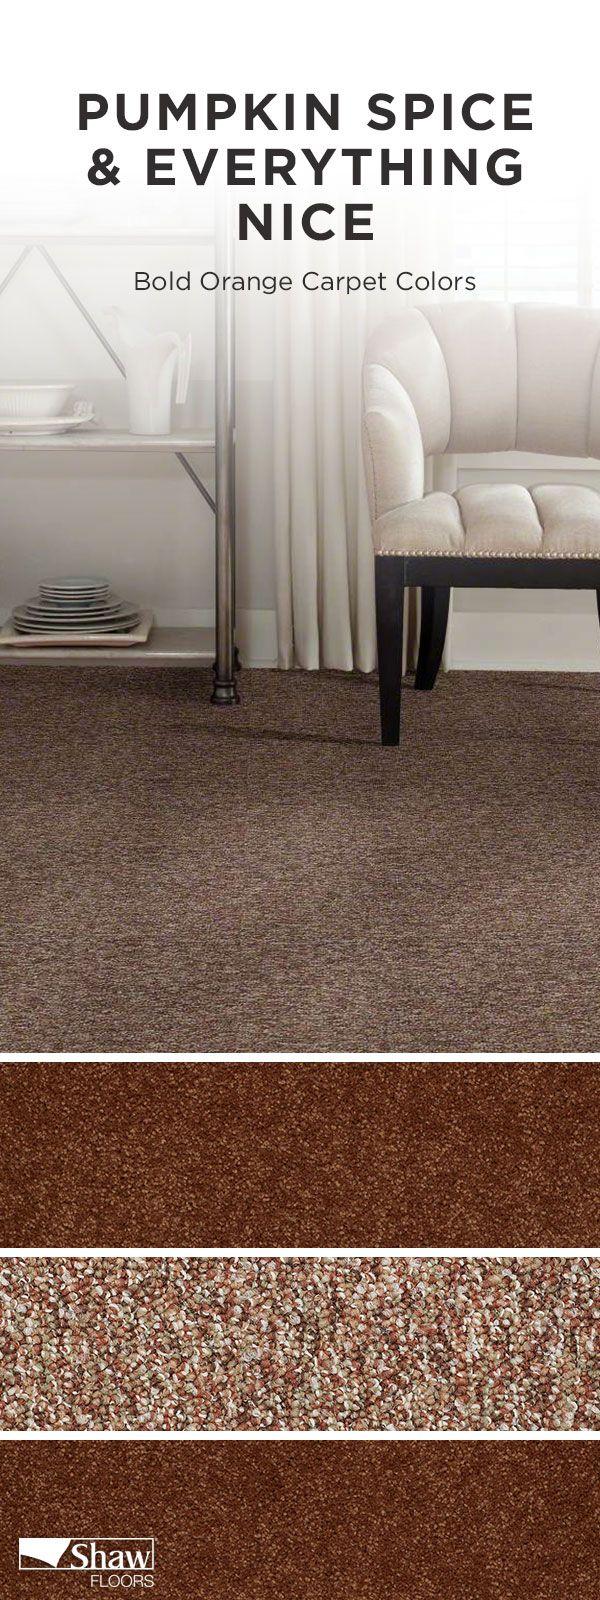 An Orange Carpet Living Room Or Orange Carpet Bedroom Is Beautiful Bold Interior Design Orange Carpet Carpet Colors Bedroom Carpet